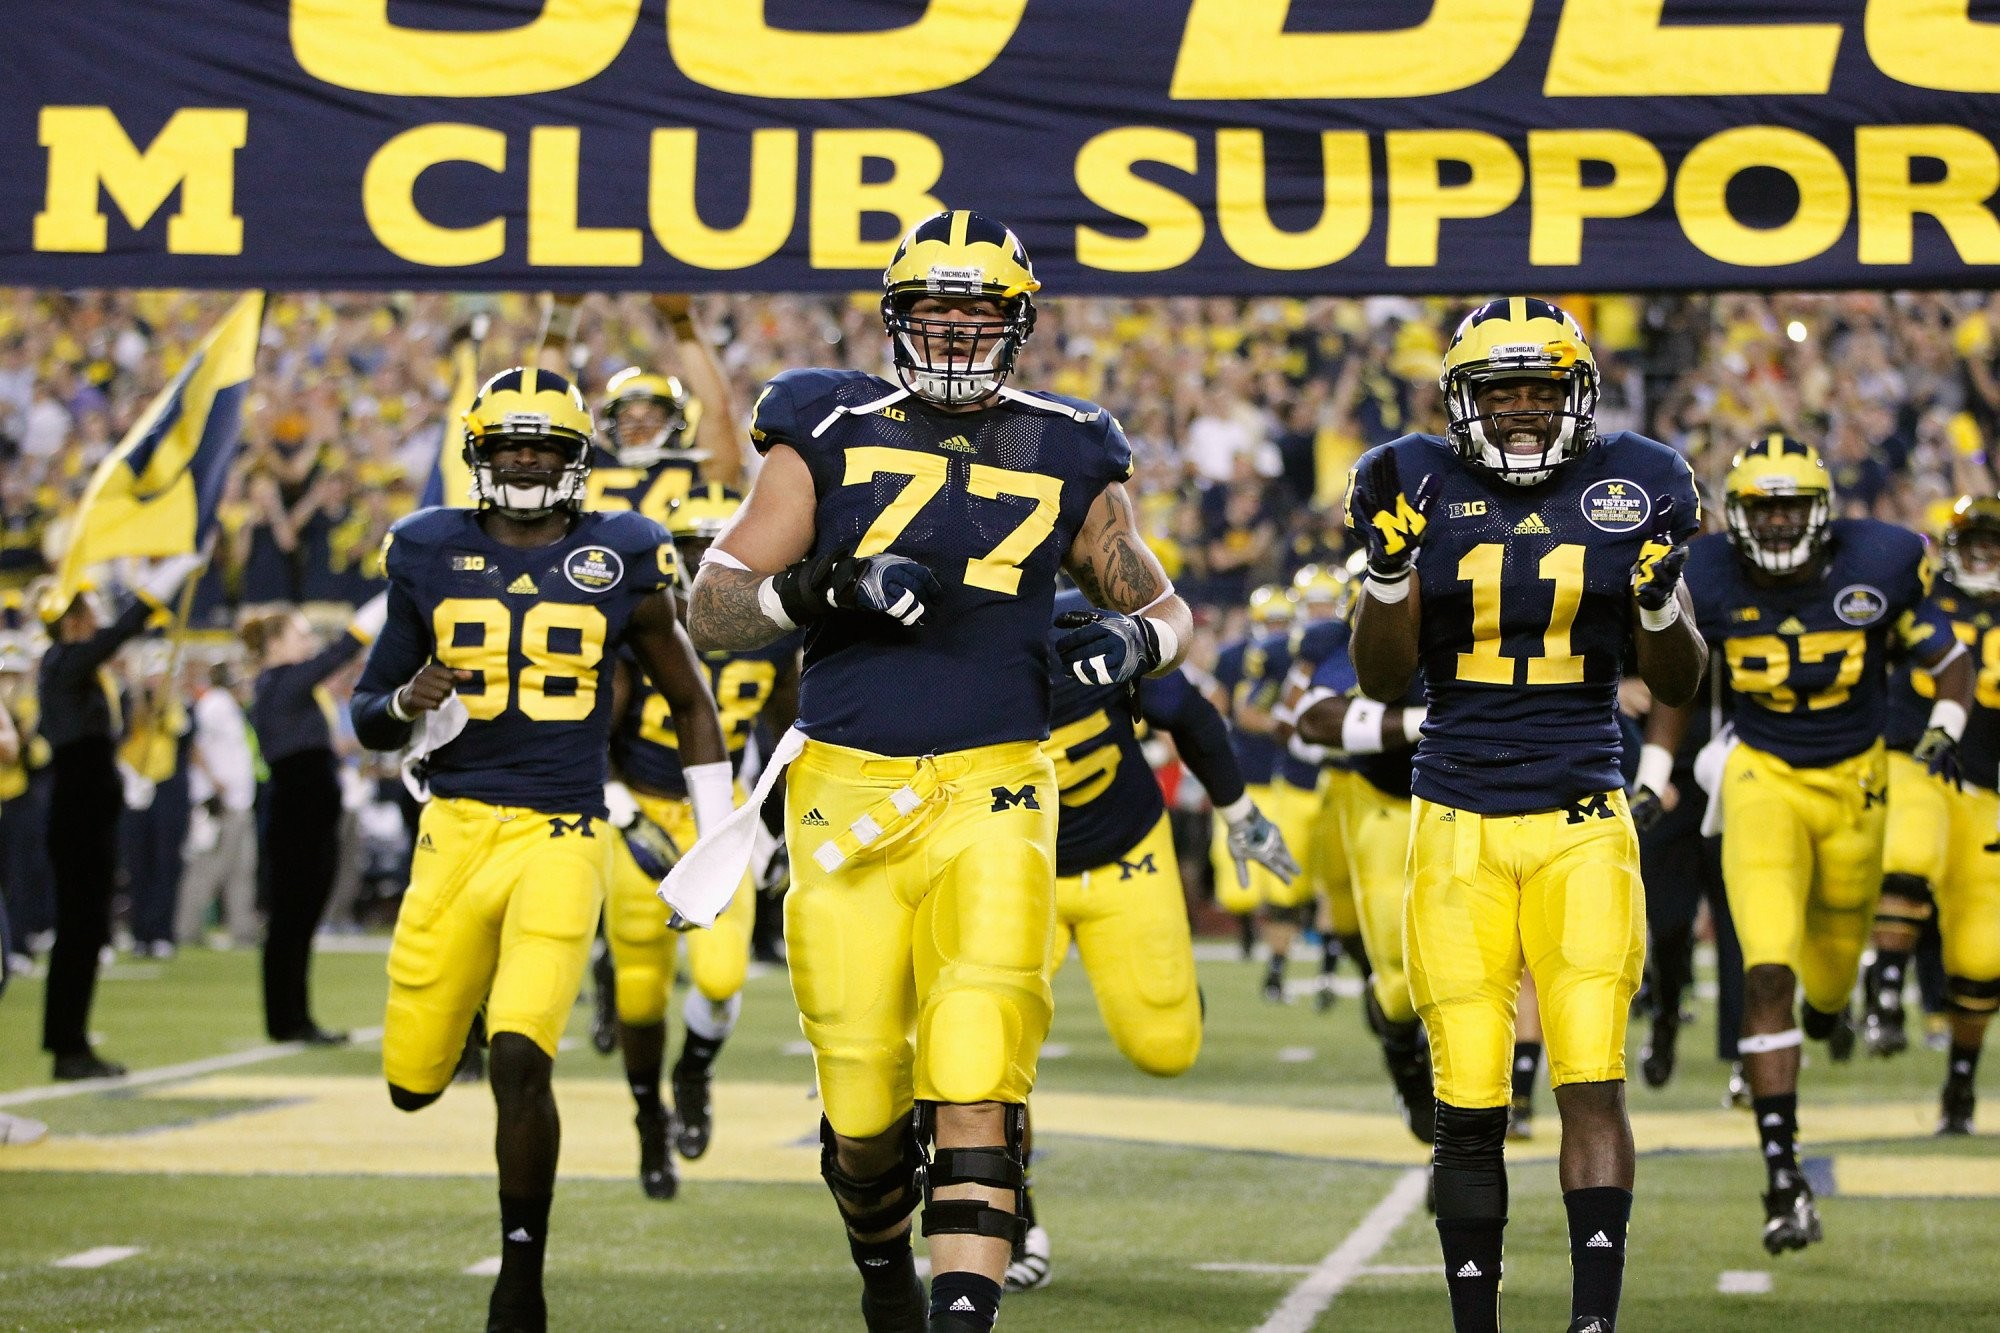 Michigan Wolverines Football Wallpaper Big Ten Football Online 2000×1333  Michigan Wolverines Football Wallpapers (